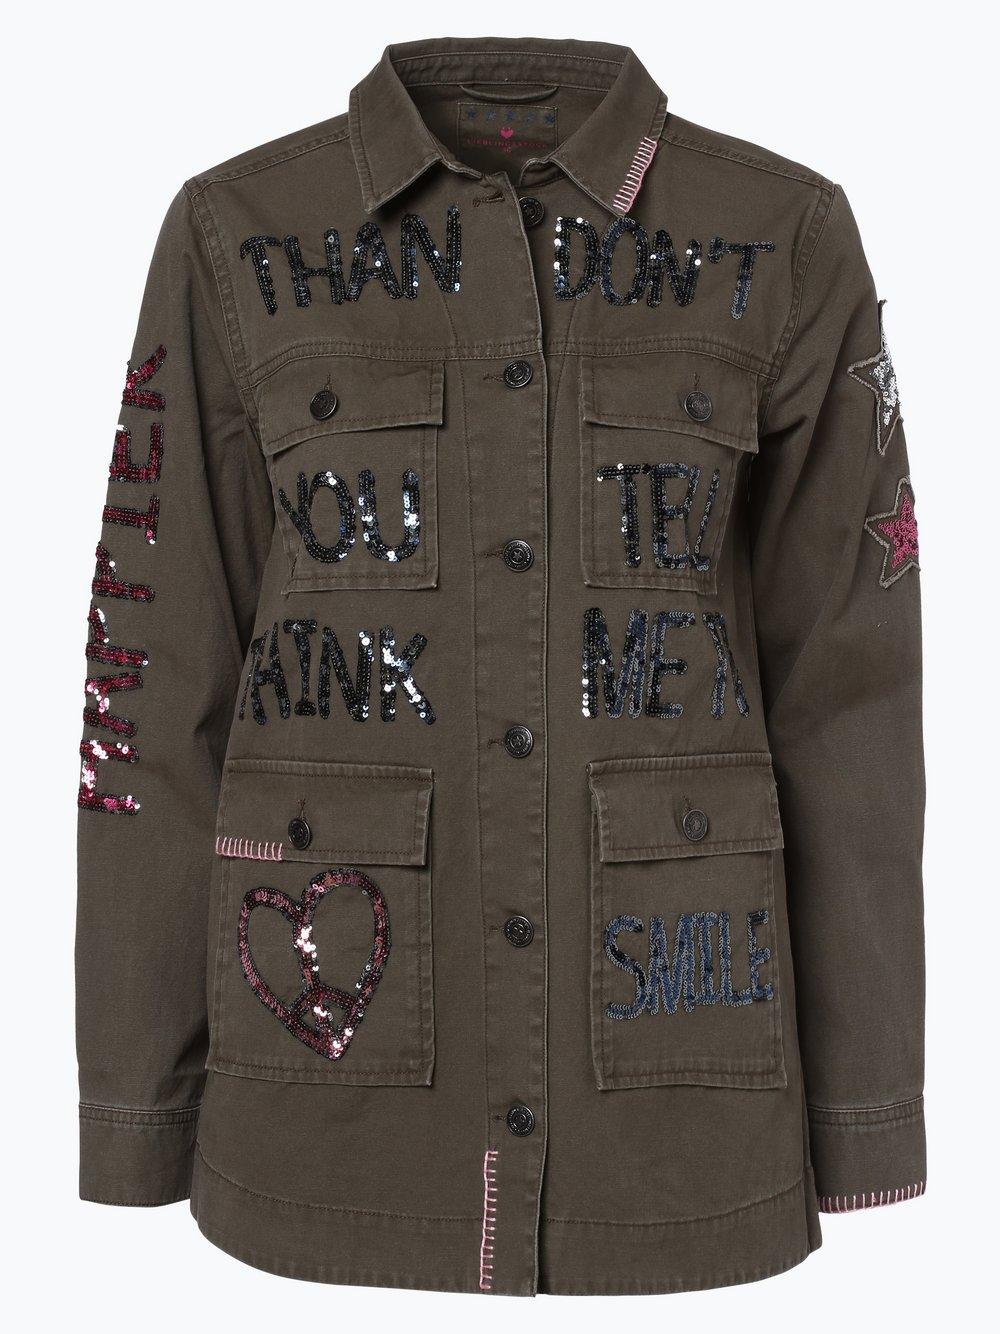 ab4990366f232 Lieblingsstück Damen Jacke - Irene online kaufen